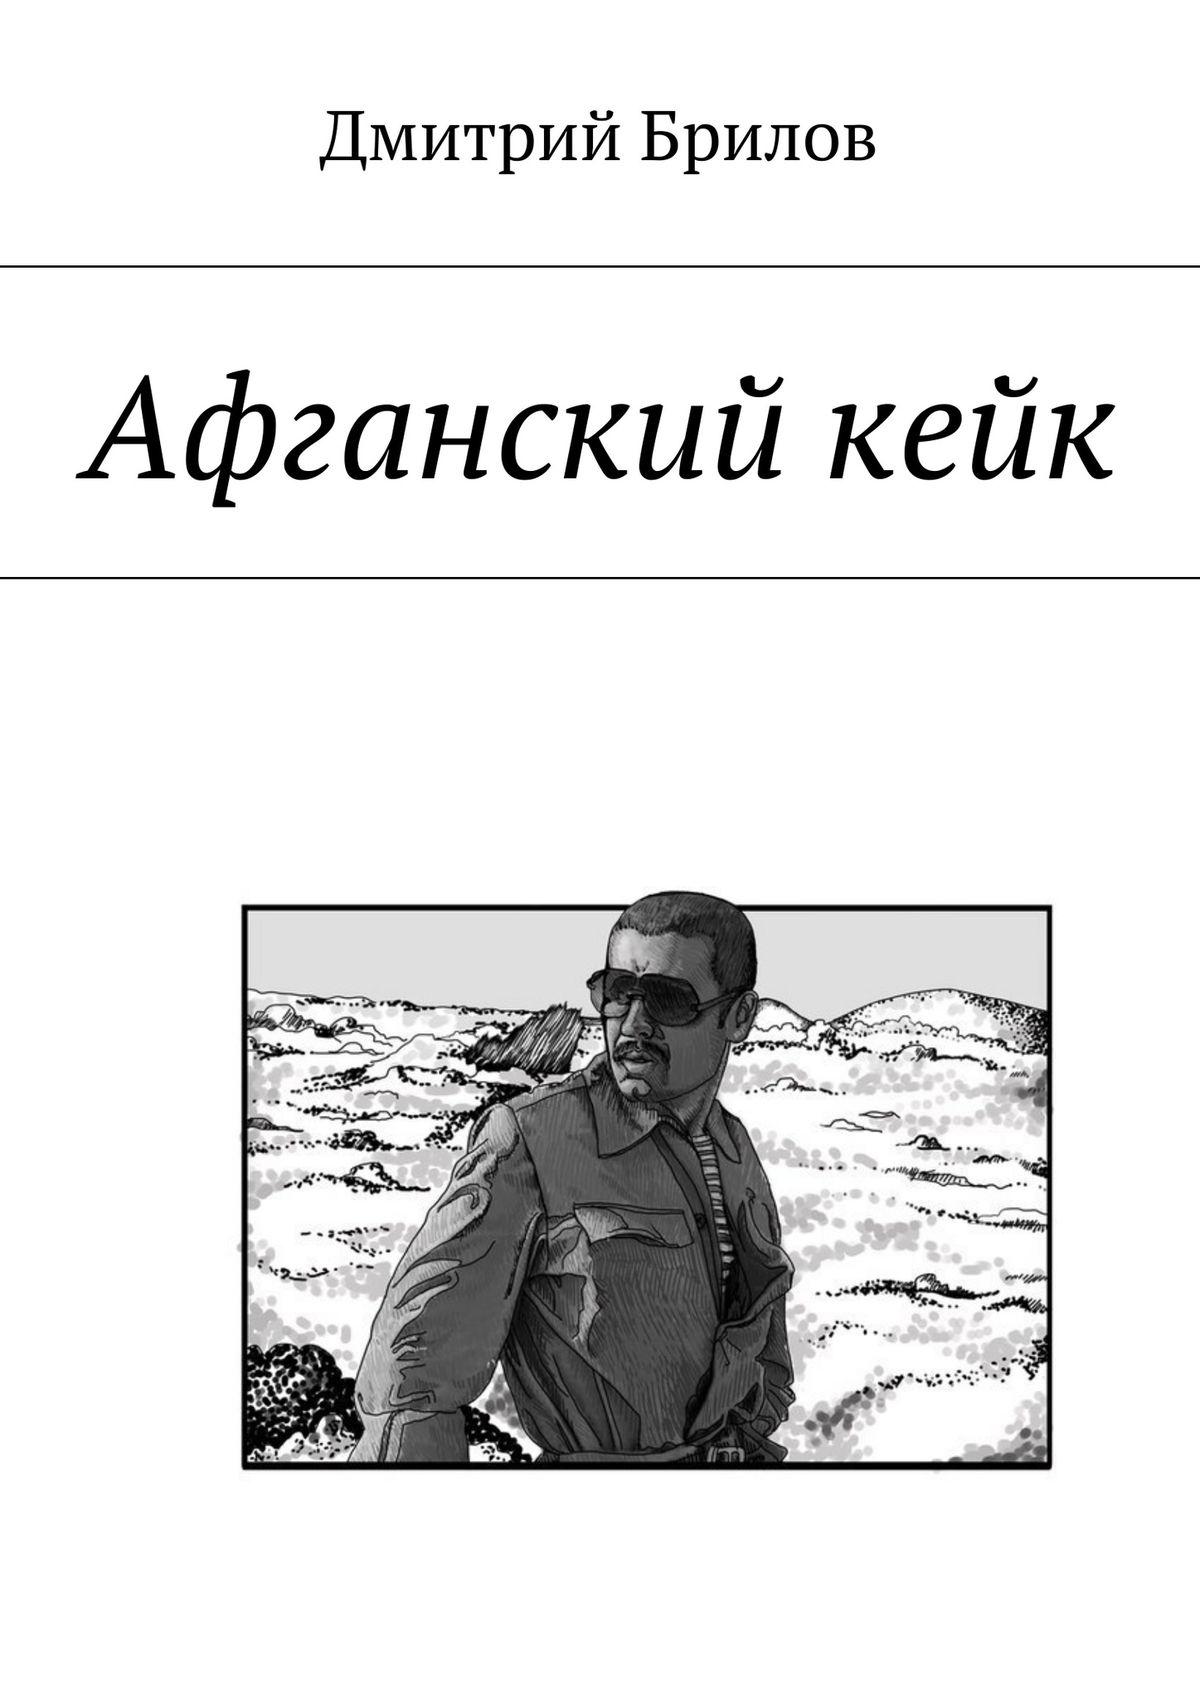 Дмитрий Брилов Афганскийкейк дмитрий брилов кофе с молоком начало